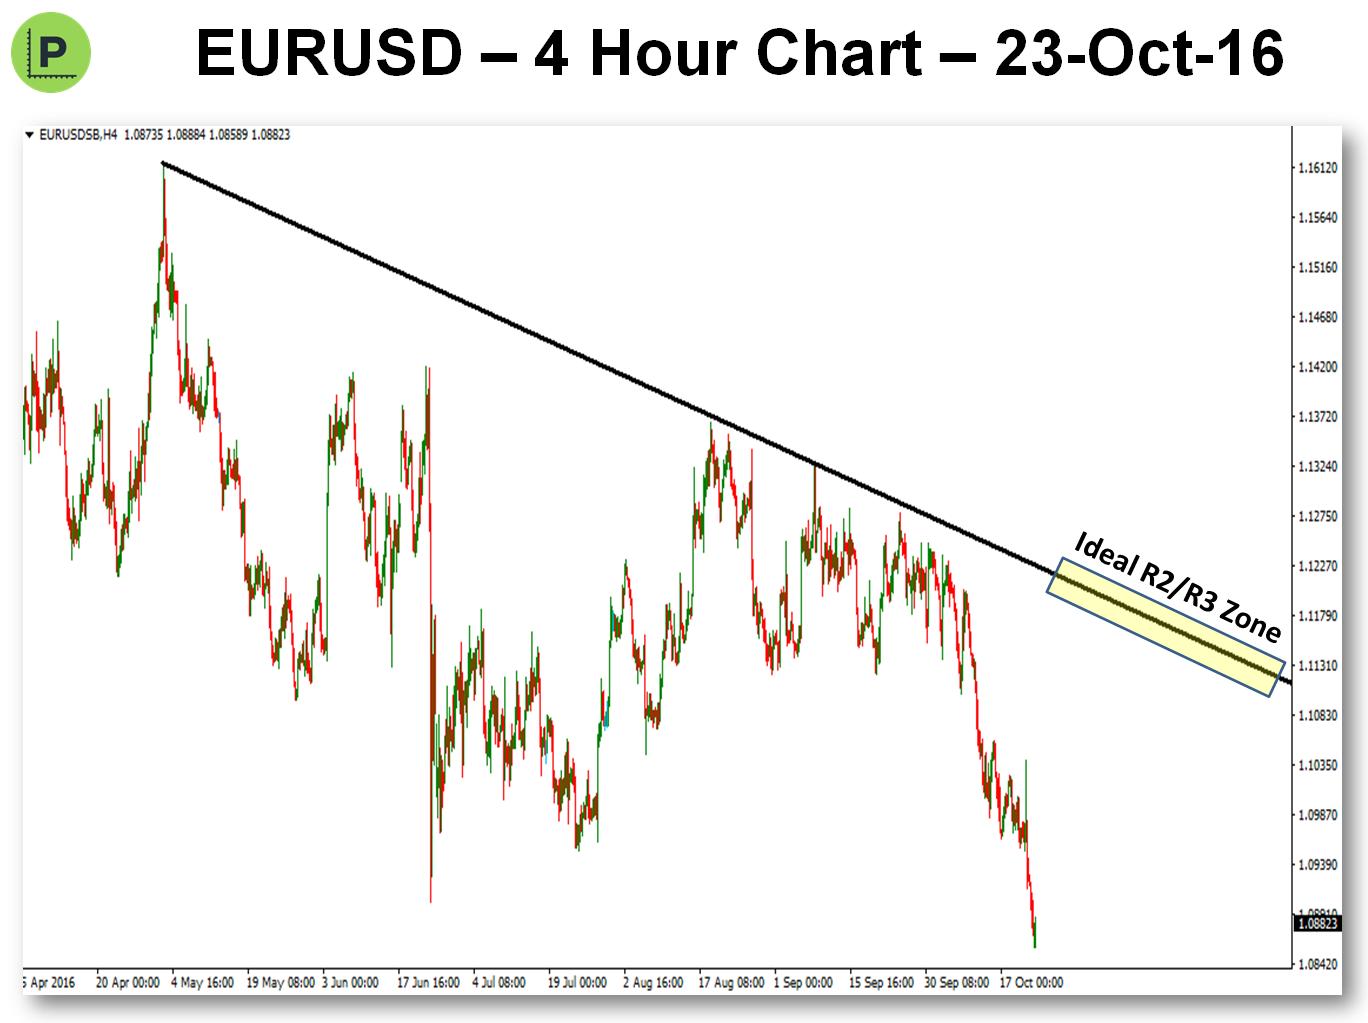 potential-pivot-trade-23-oct-16-eurusd